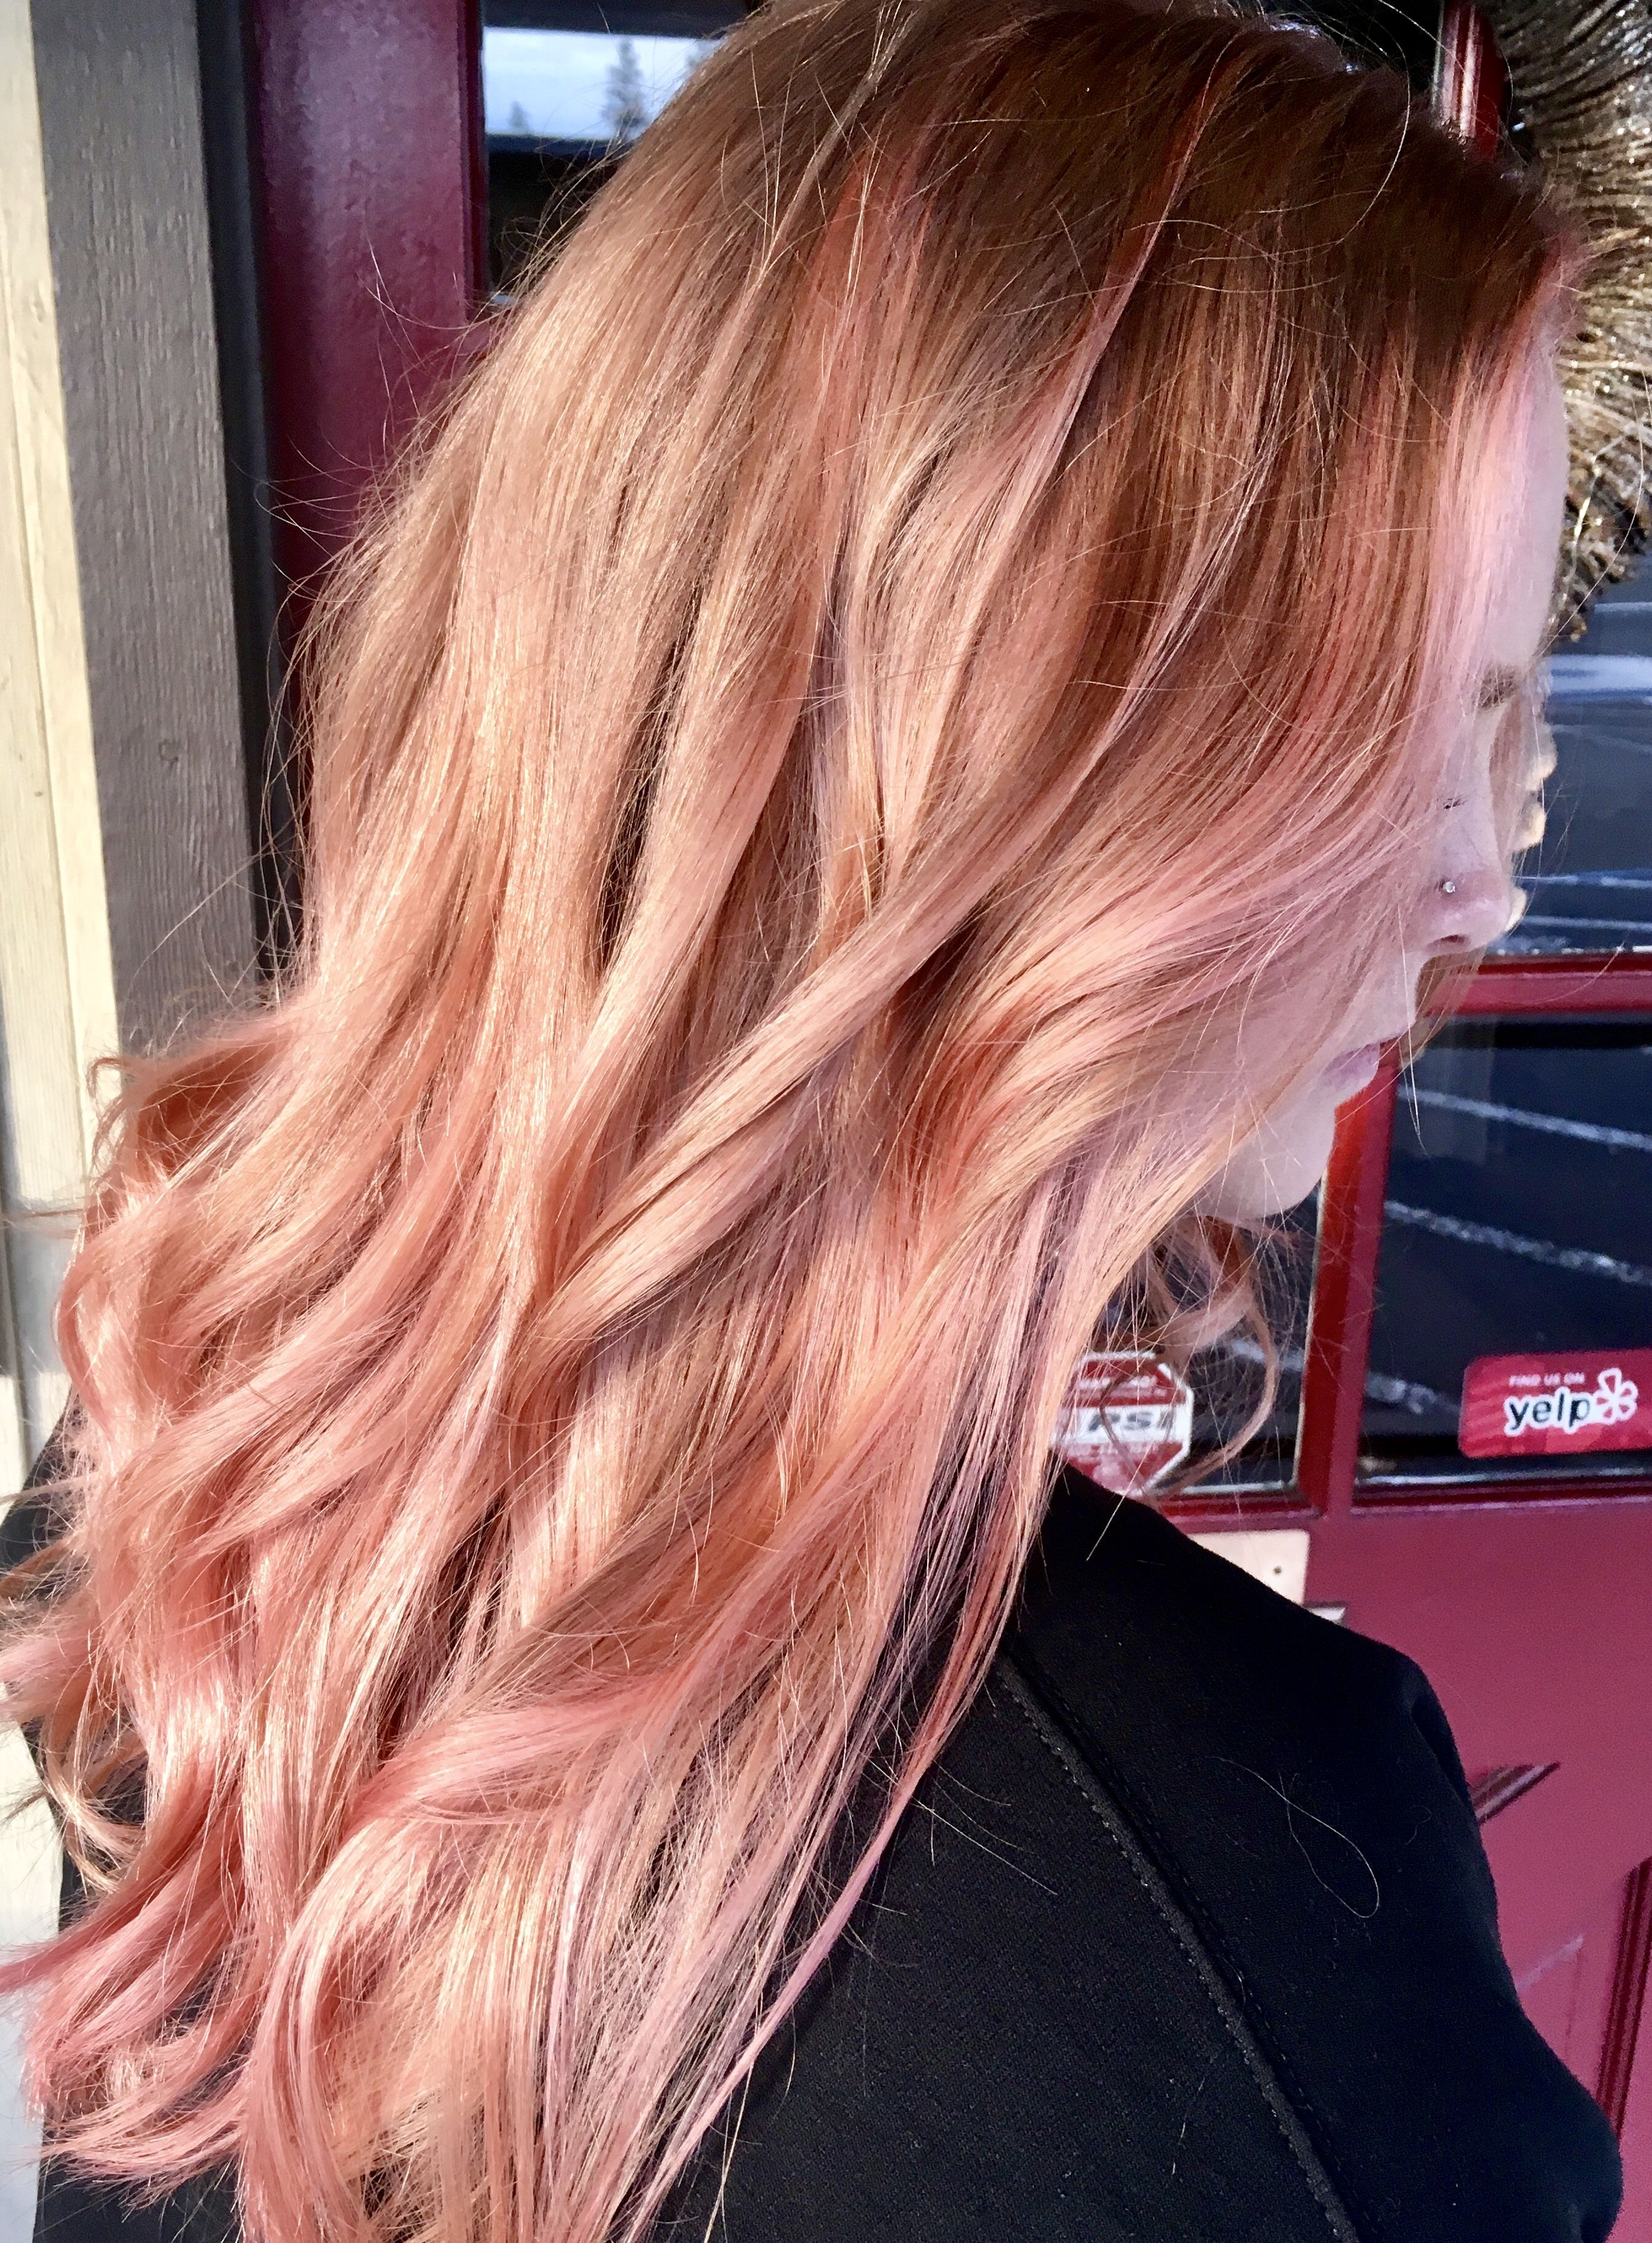 Beautiful Pink Rose Gold Balayage Does Hair Dye Expire Dyed Hair Hair